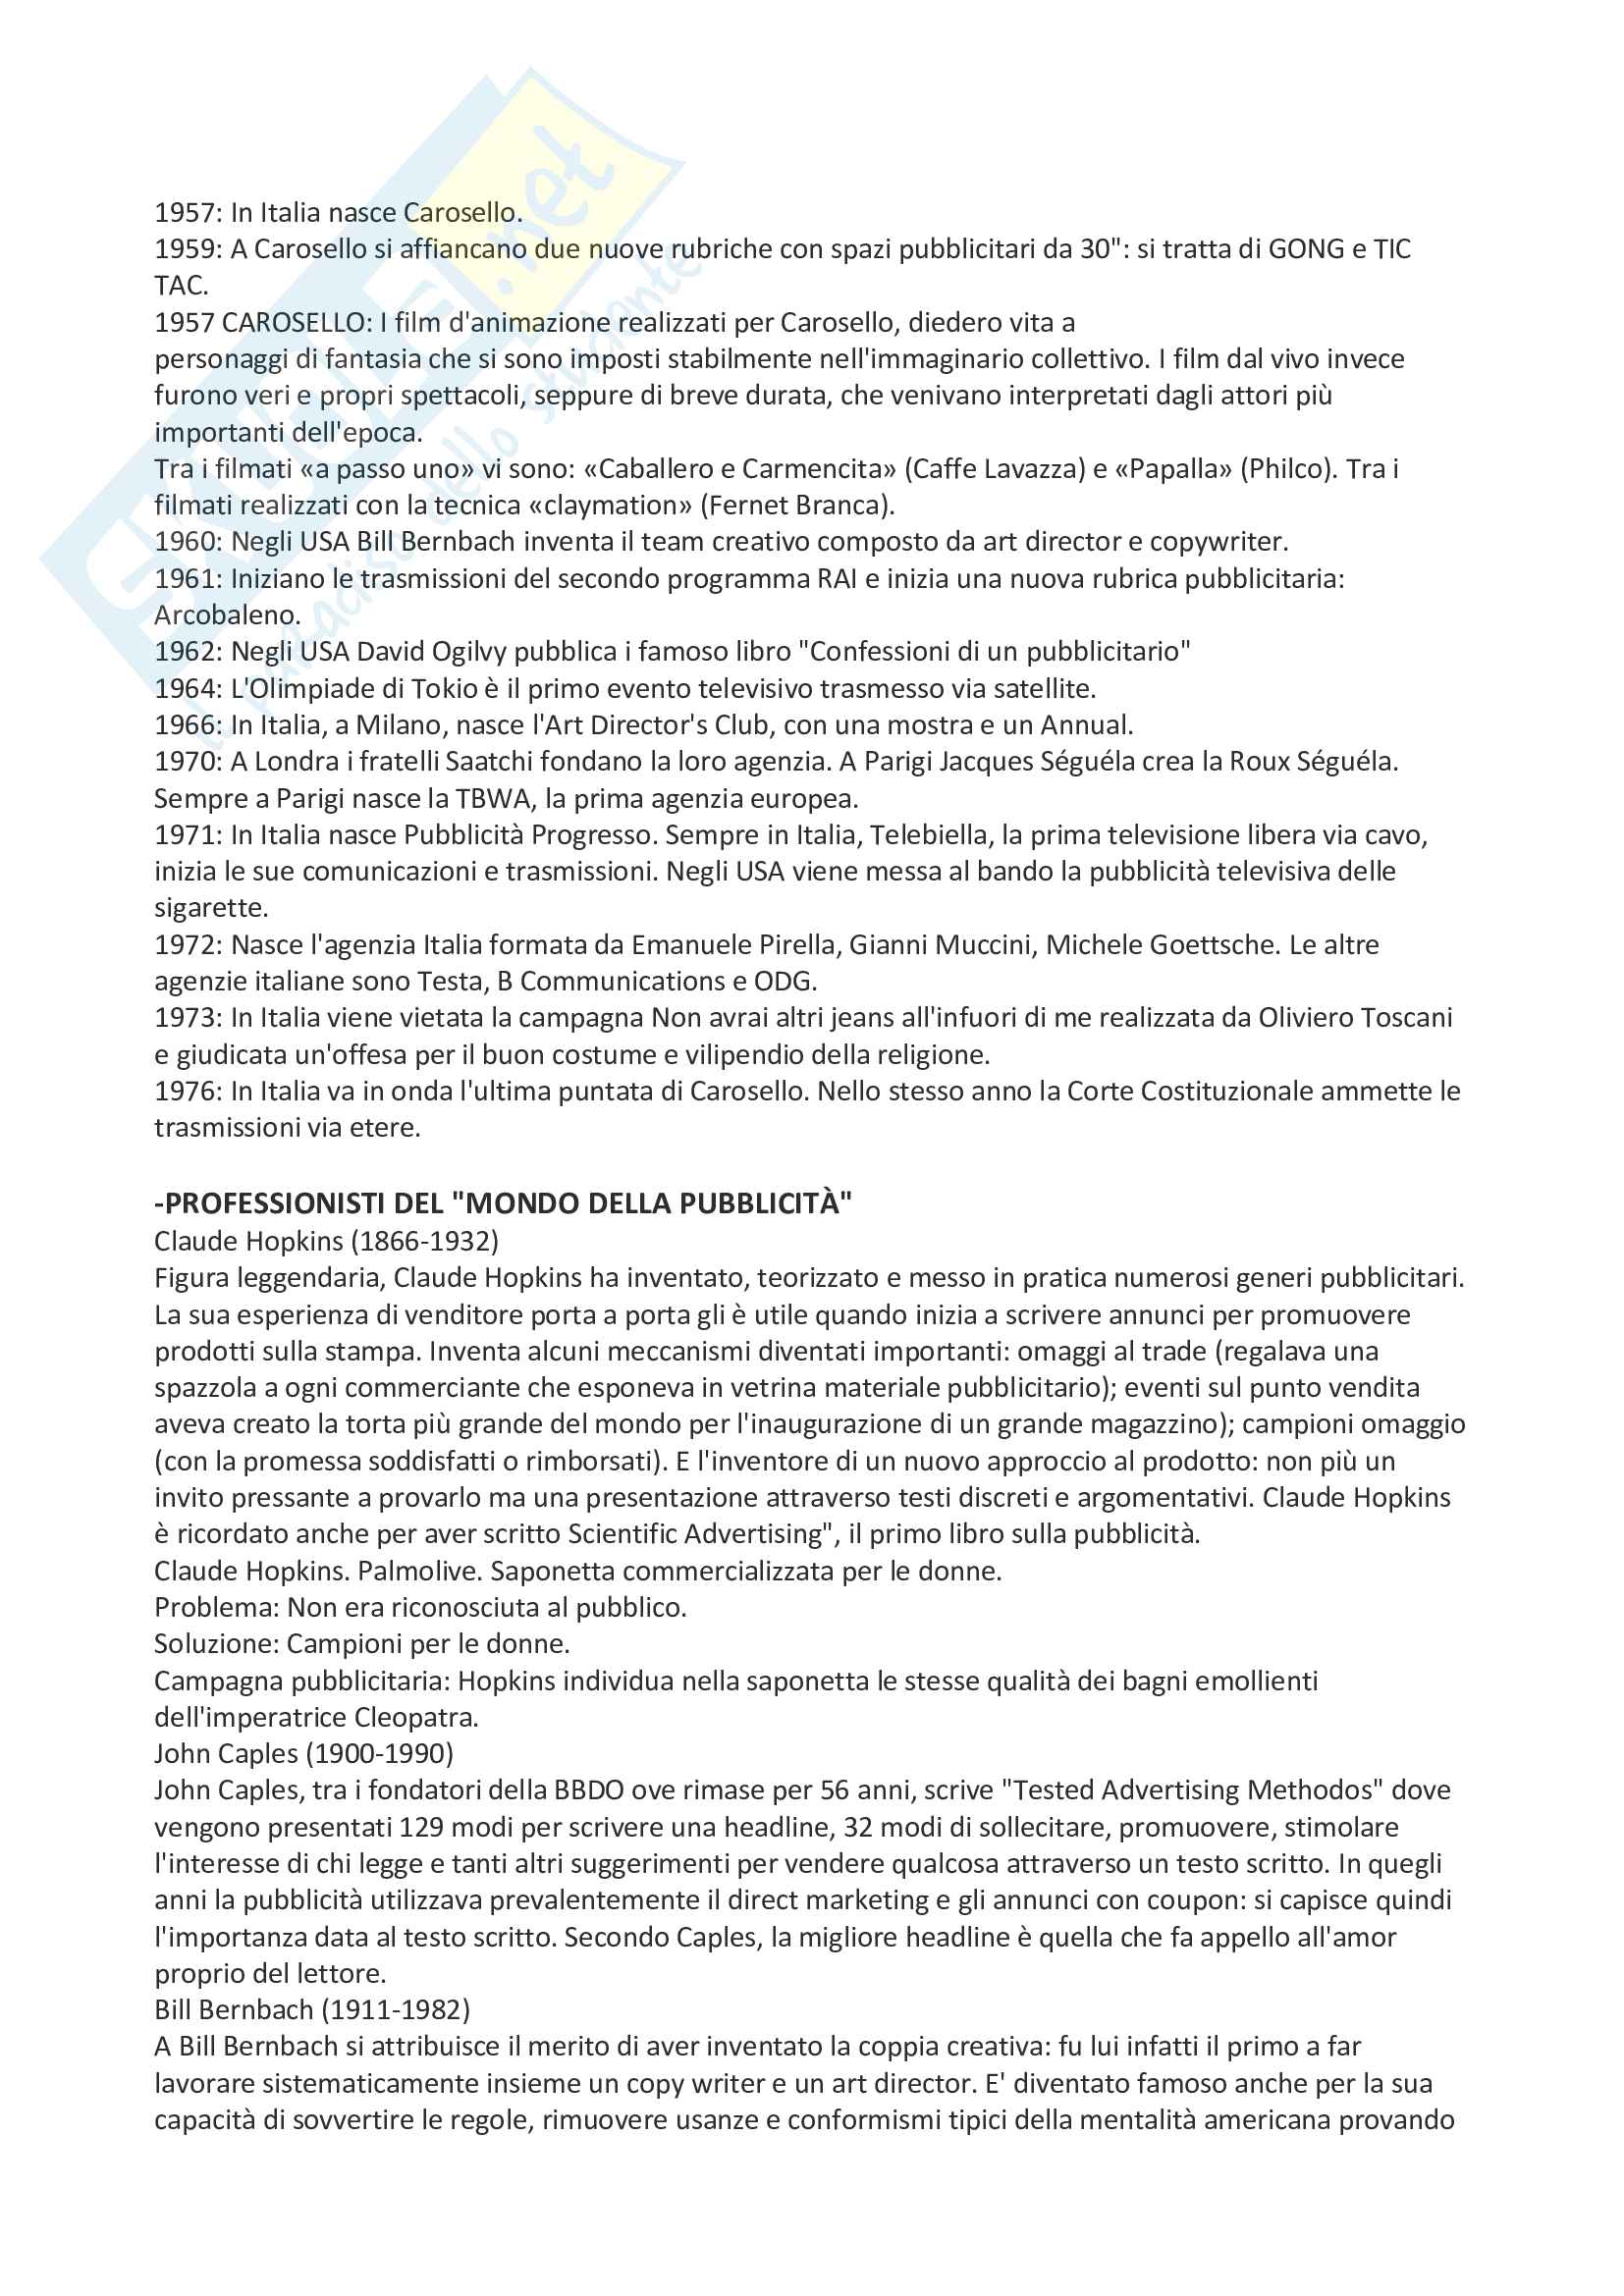 Riassunto Strategie di comunicazione d'impresa Pag. 36